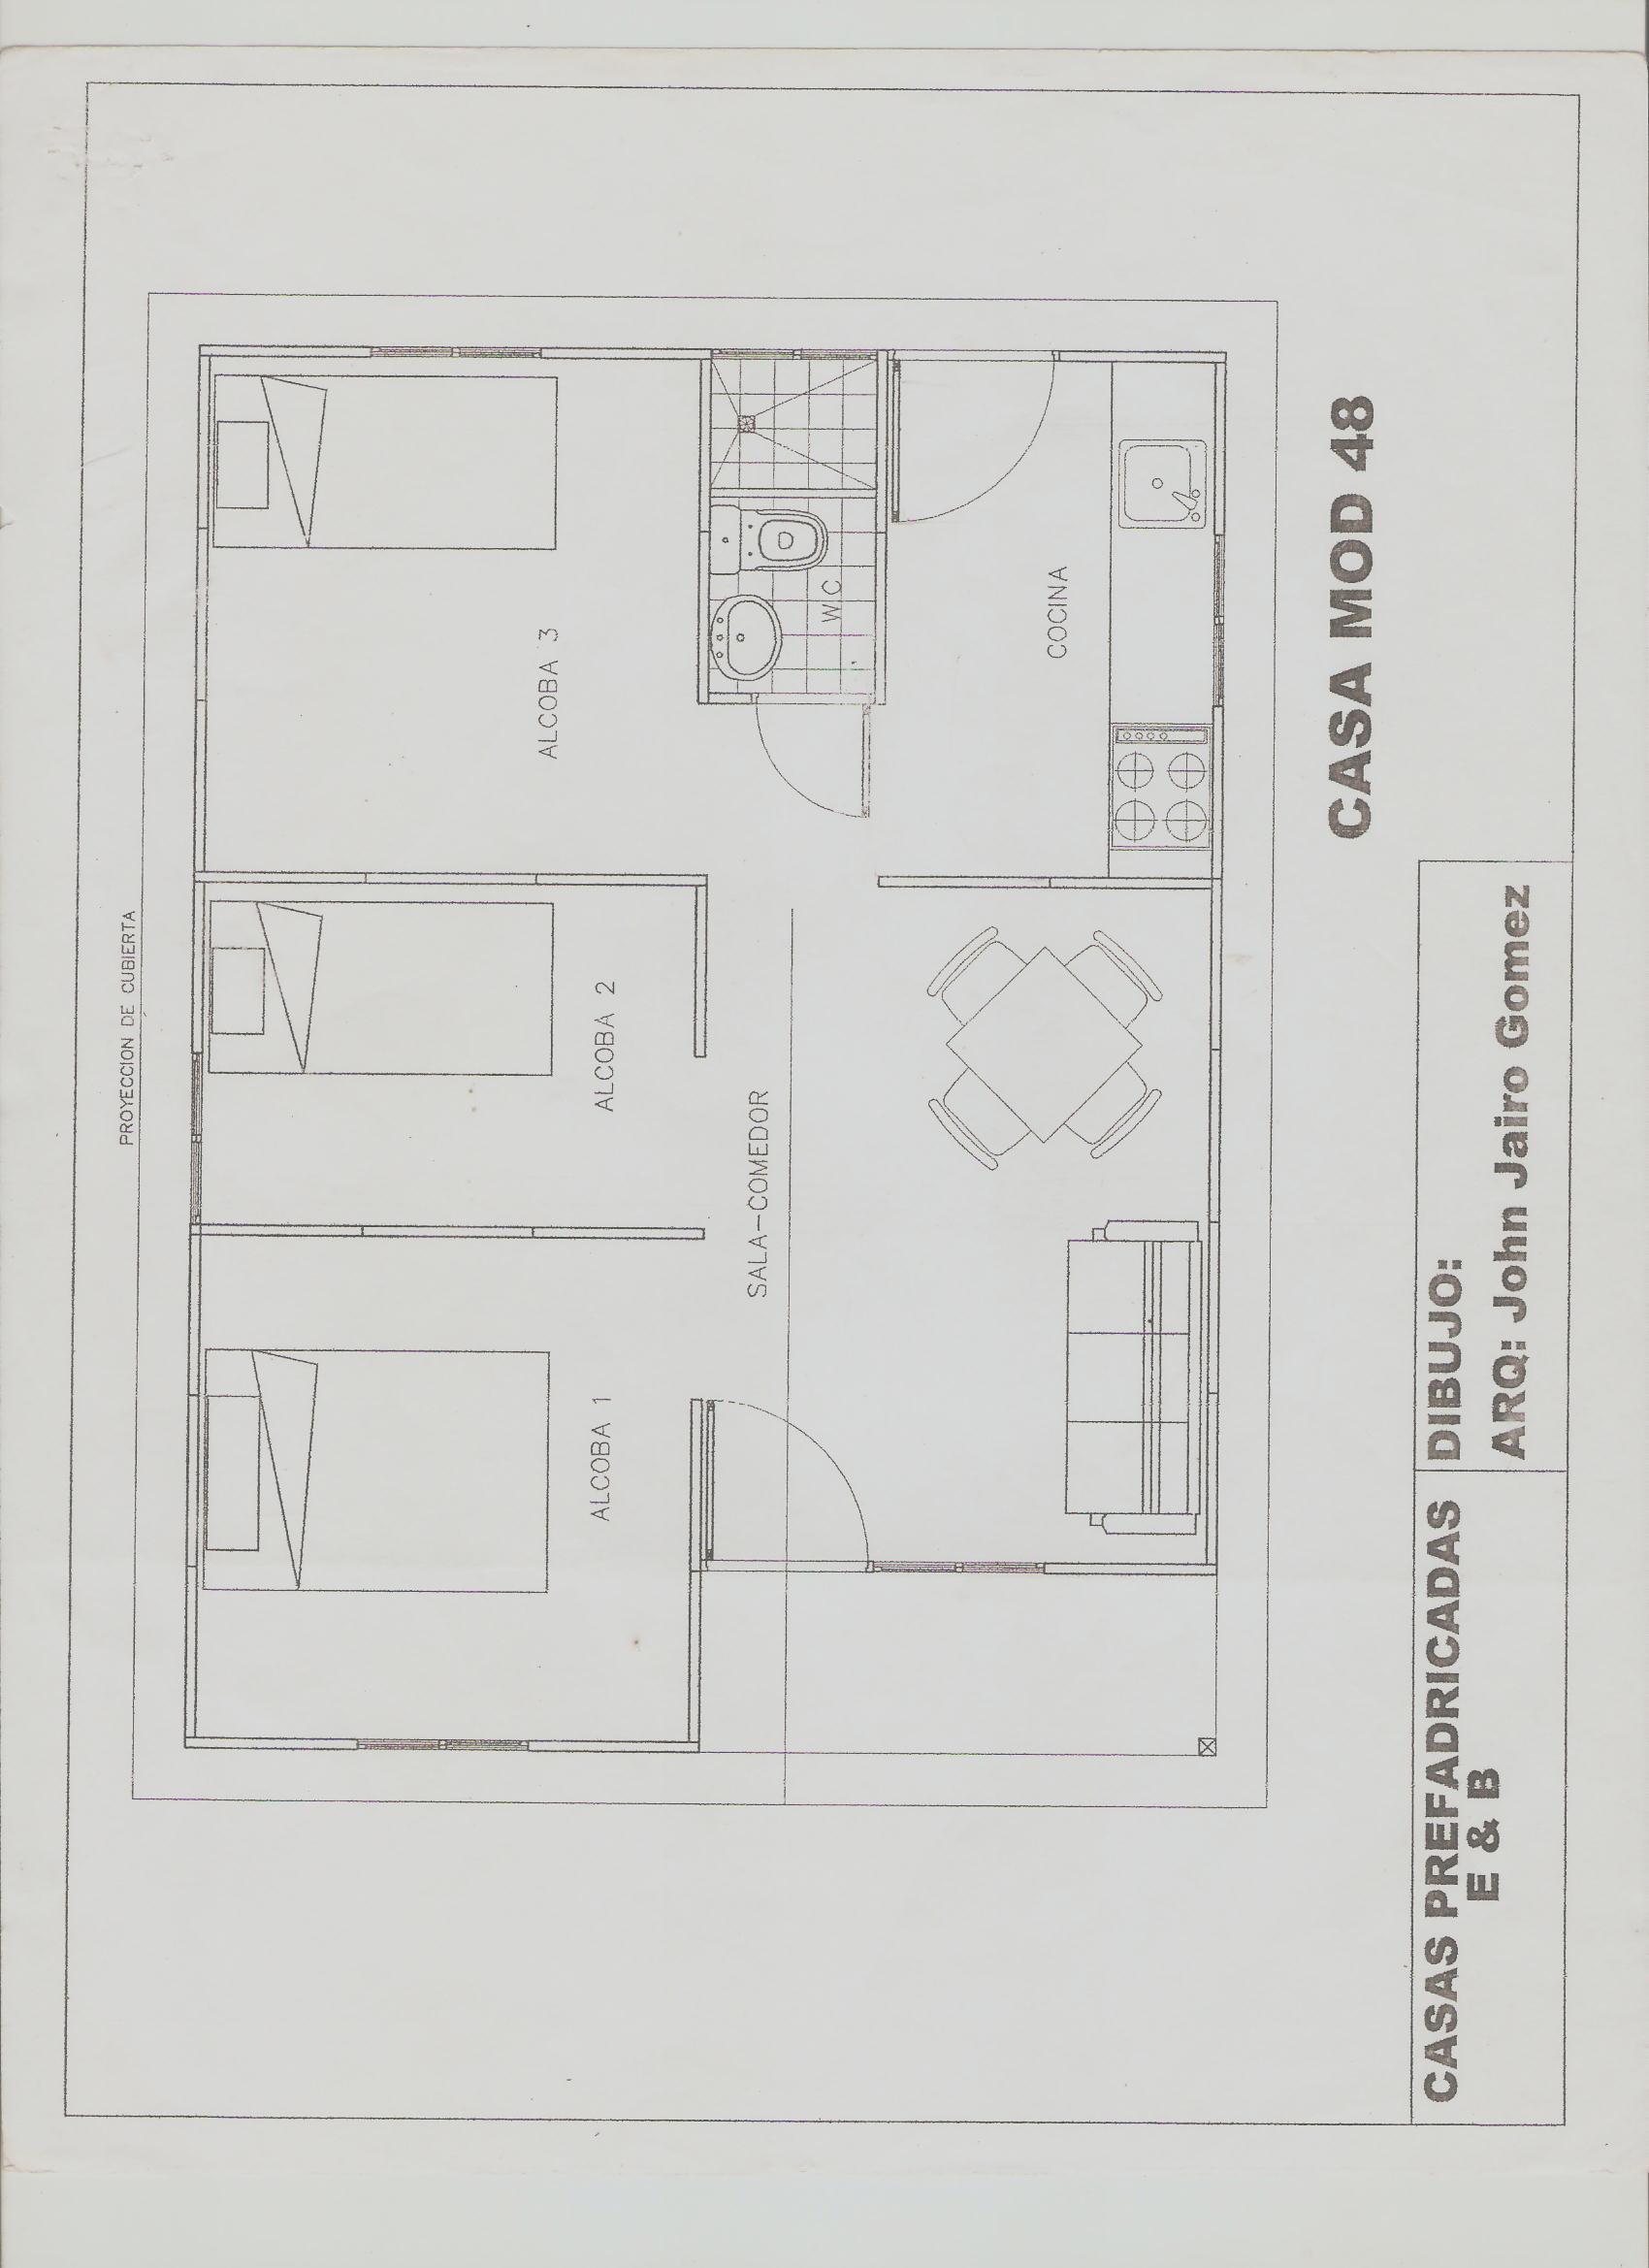 Planos Casas Prefabricadas Bonilla